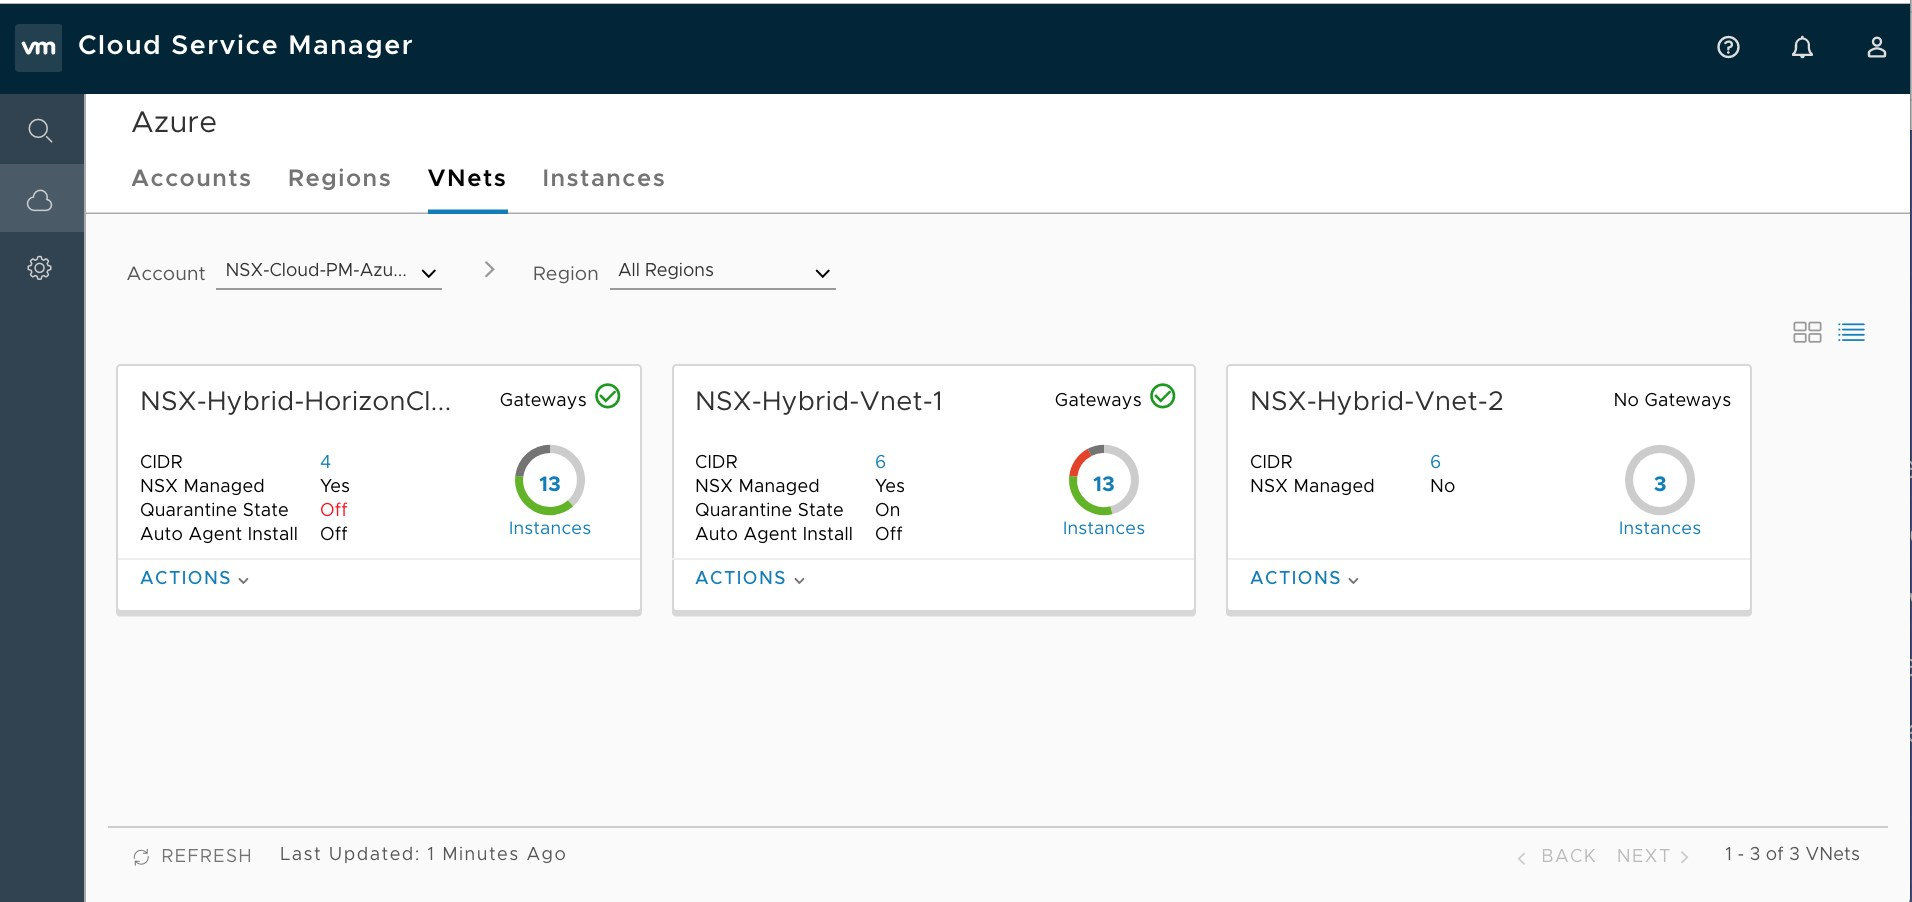 VMware NSX Cloud